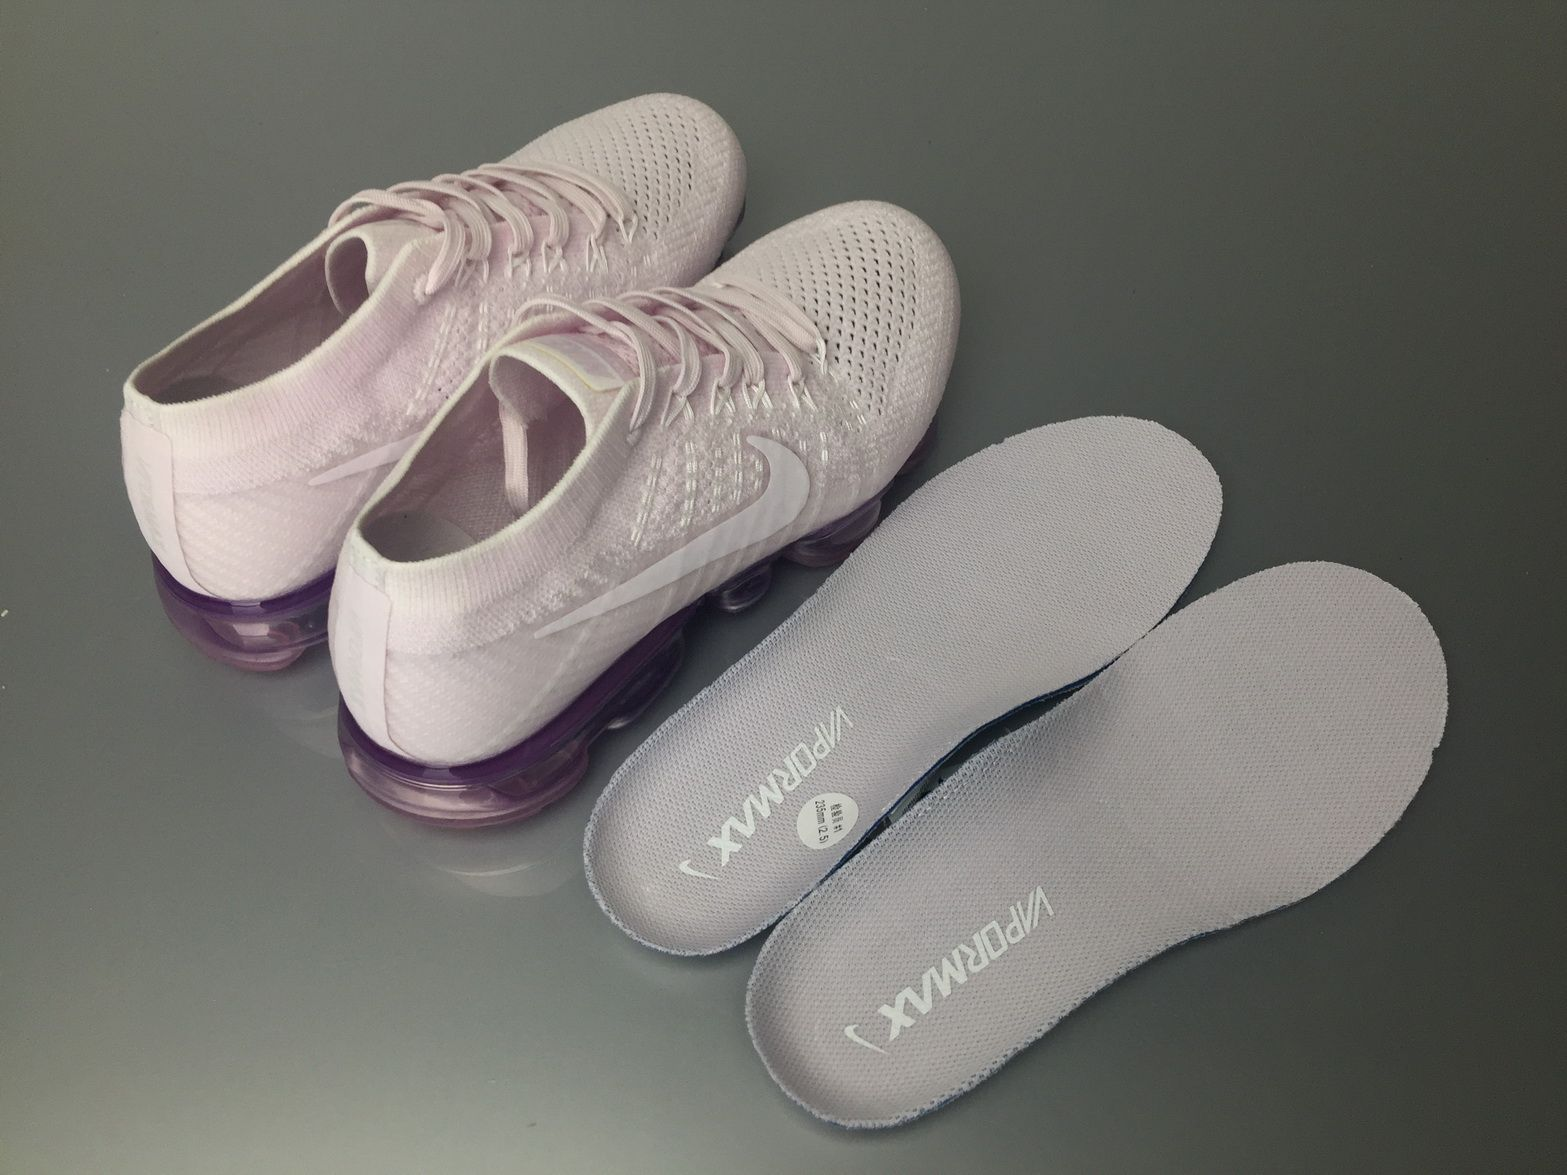 nike air vapormax 2018 849557501 bianco rosa le scarpe nike air  7